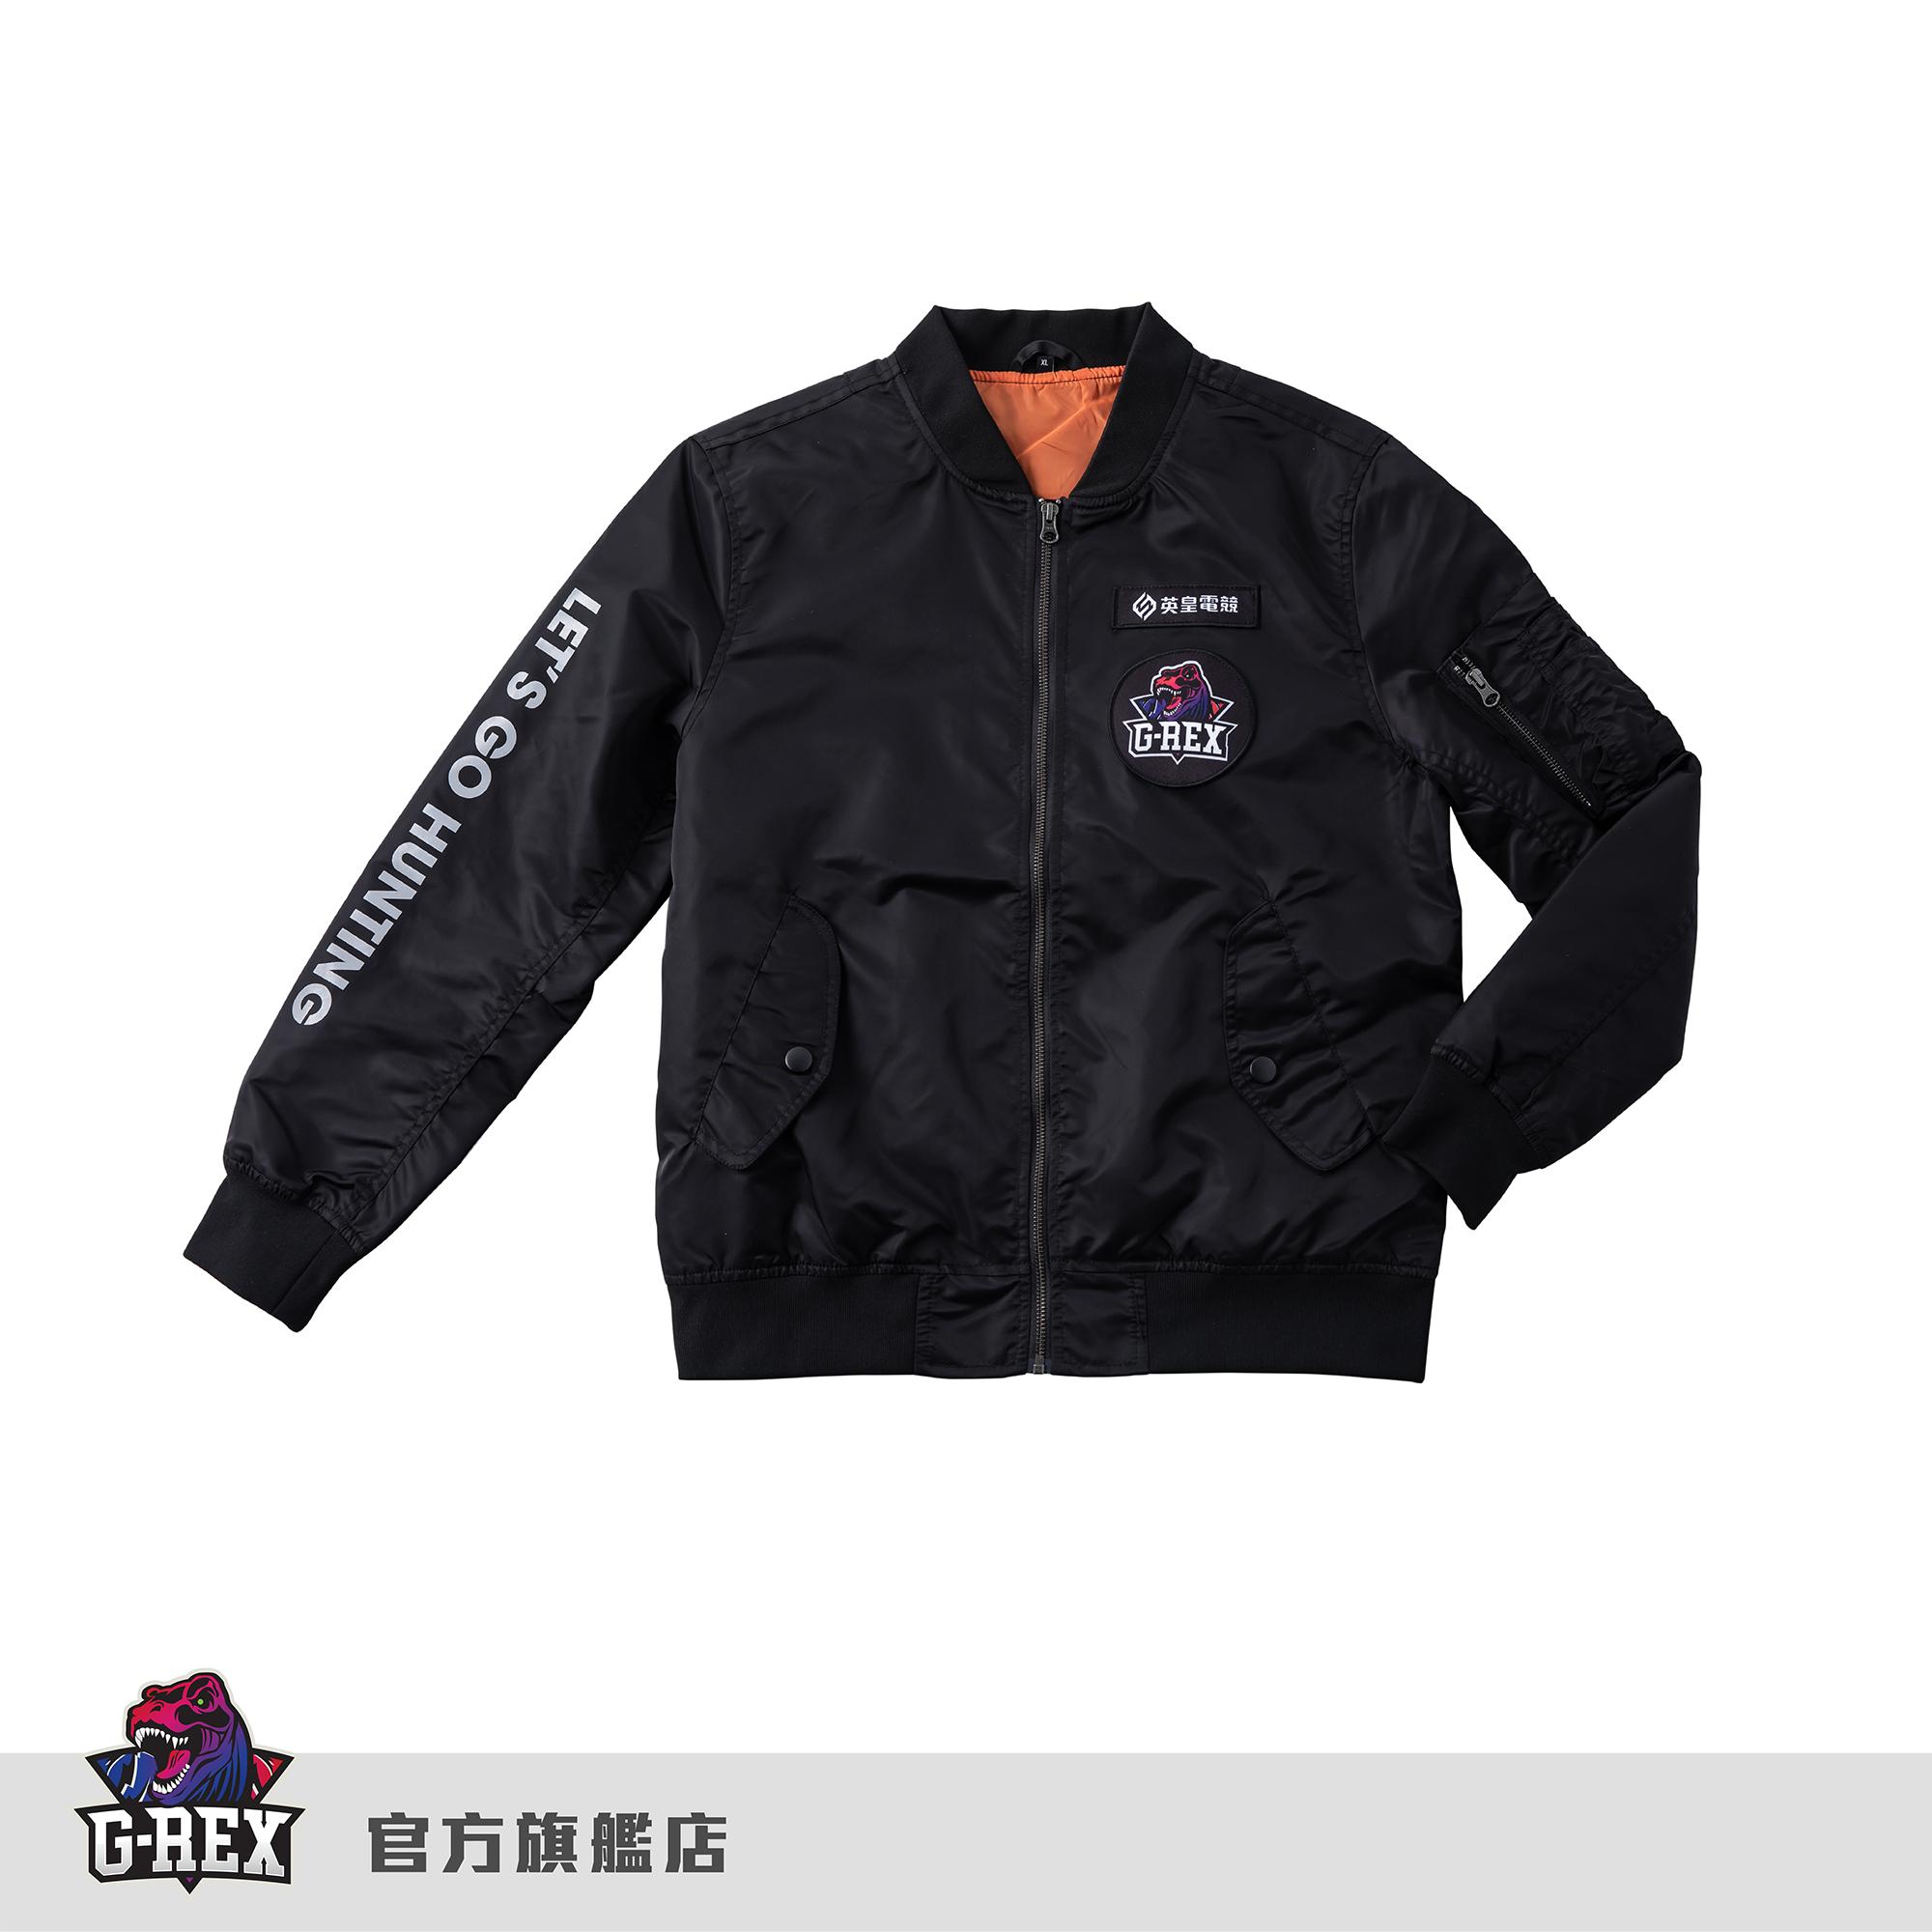 [G-Rex] 經典戰隊外套      HKD $700